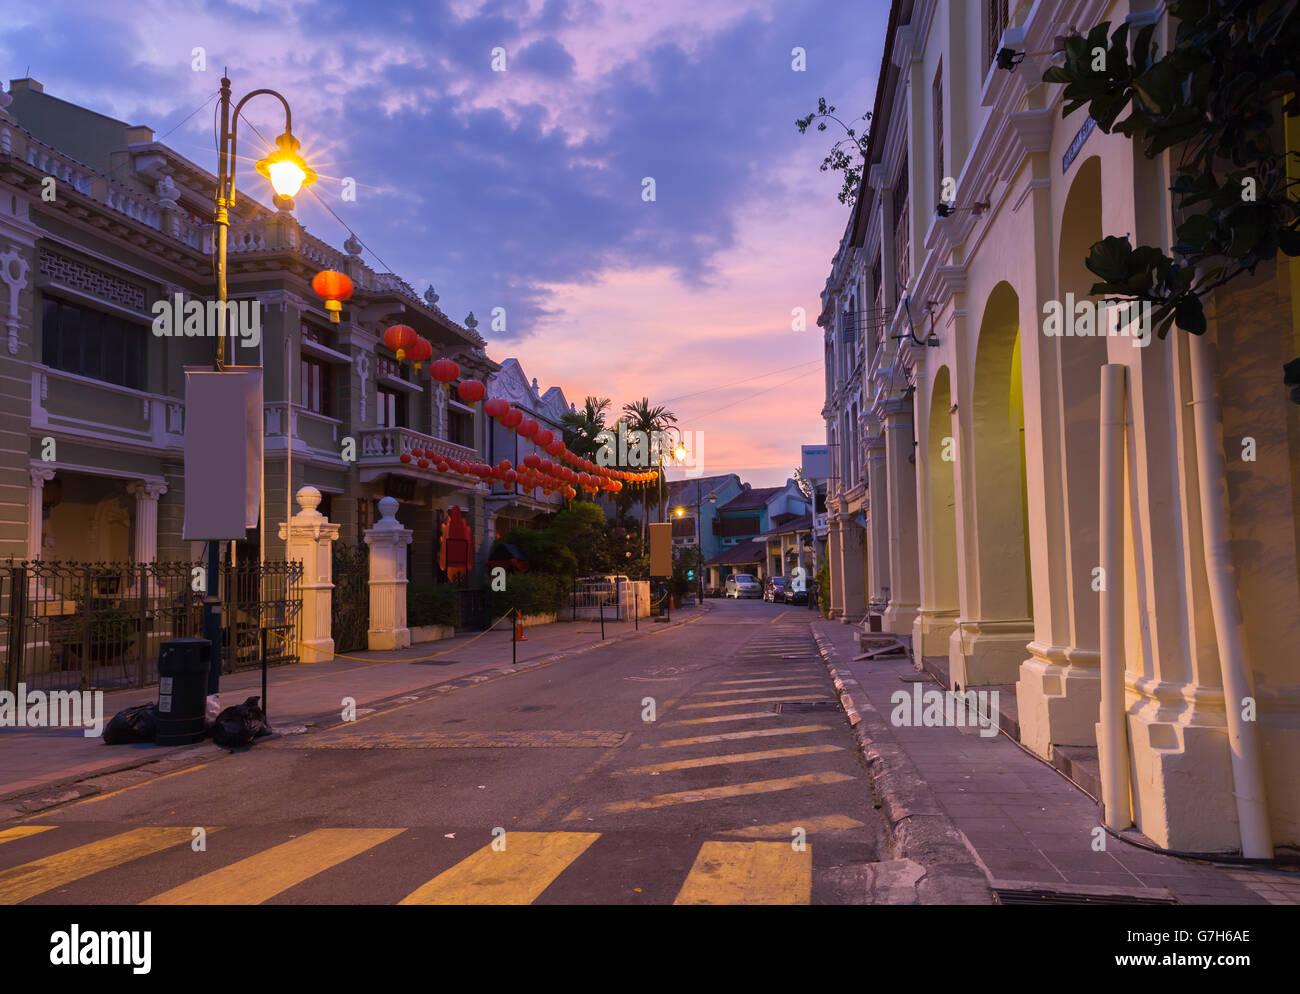 Abenddämmerung Blick auf Armenian Street und Yap Kongsi Clan Haus, George Town, Penang, Malaysia. Stockbild